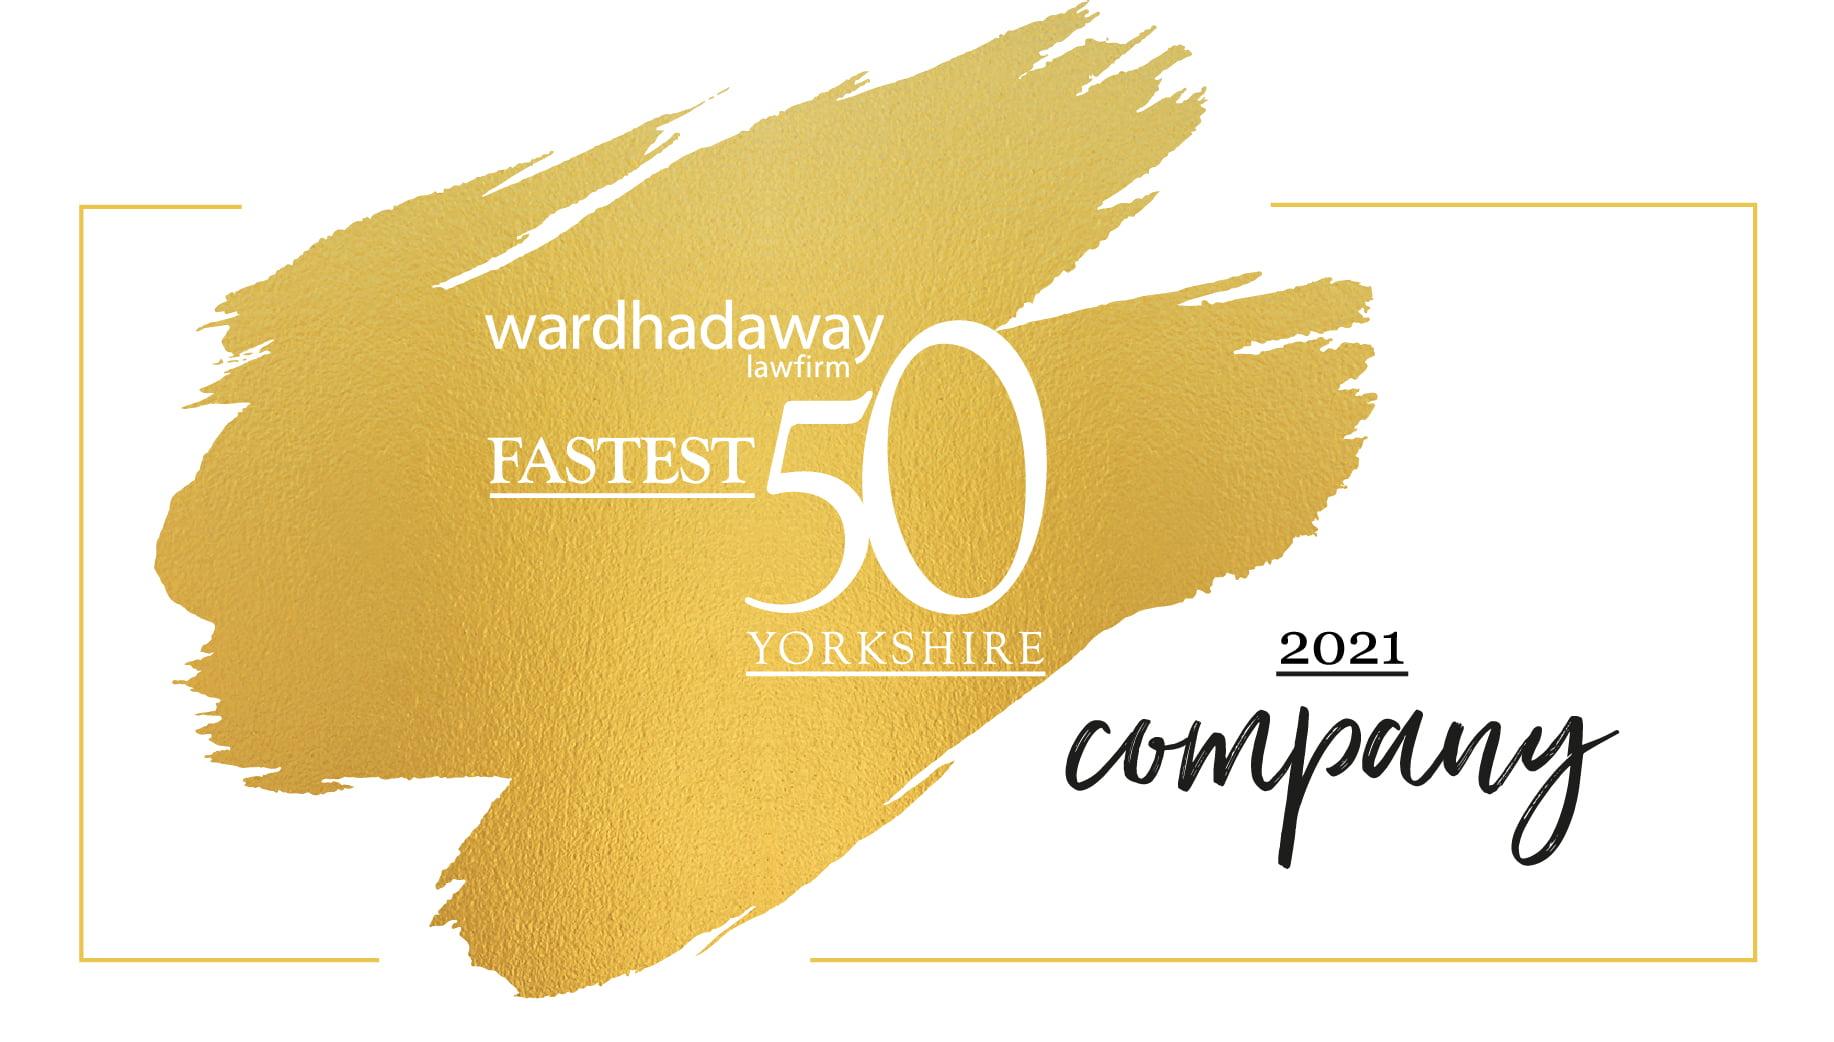 Yorkshire Fastest 50